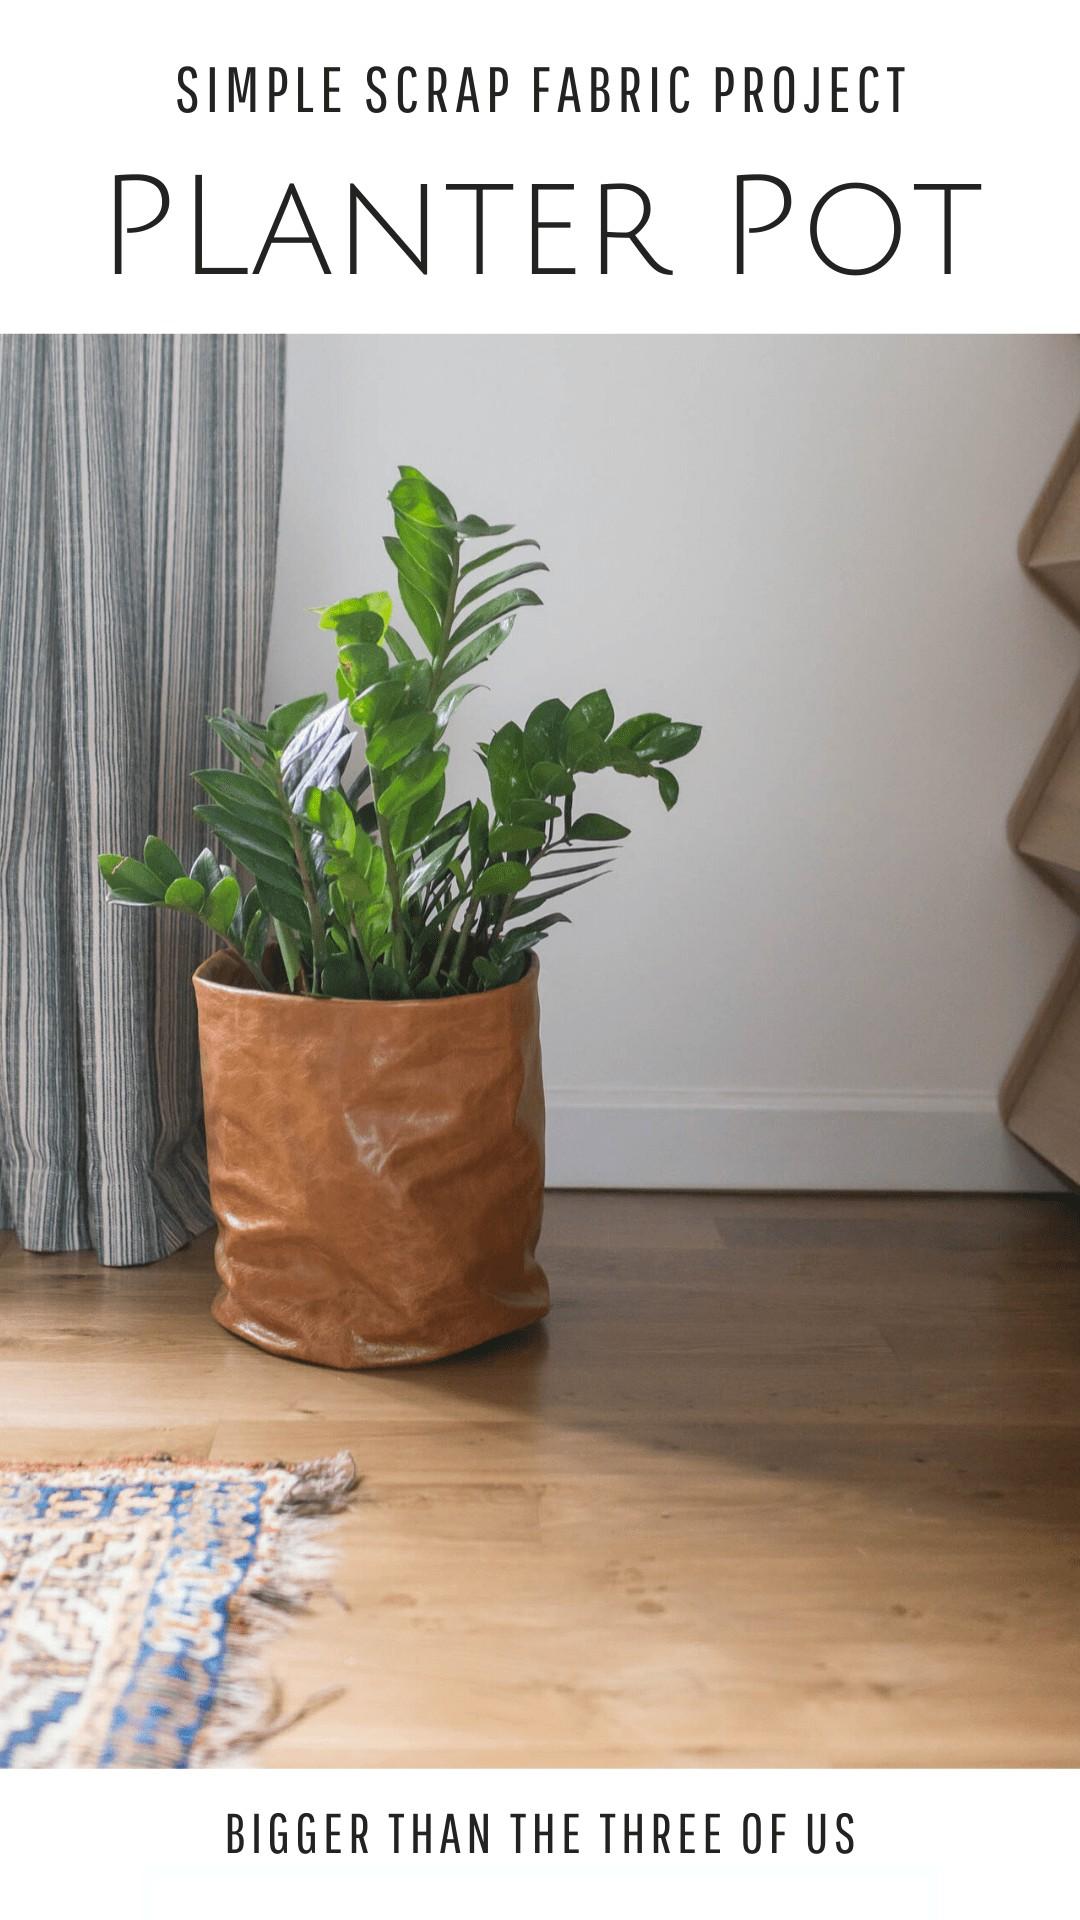 Planter pot DIY using scrap fabric